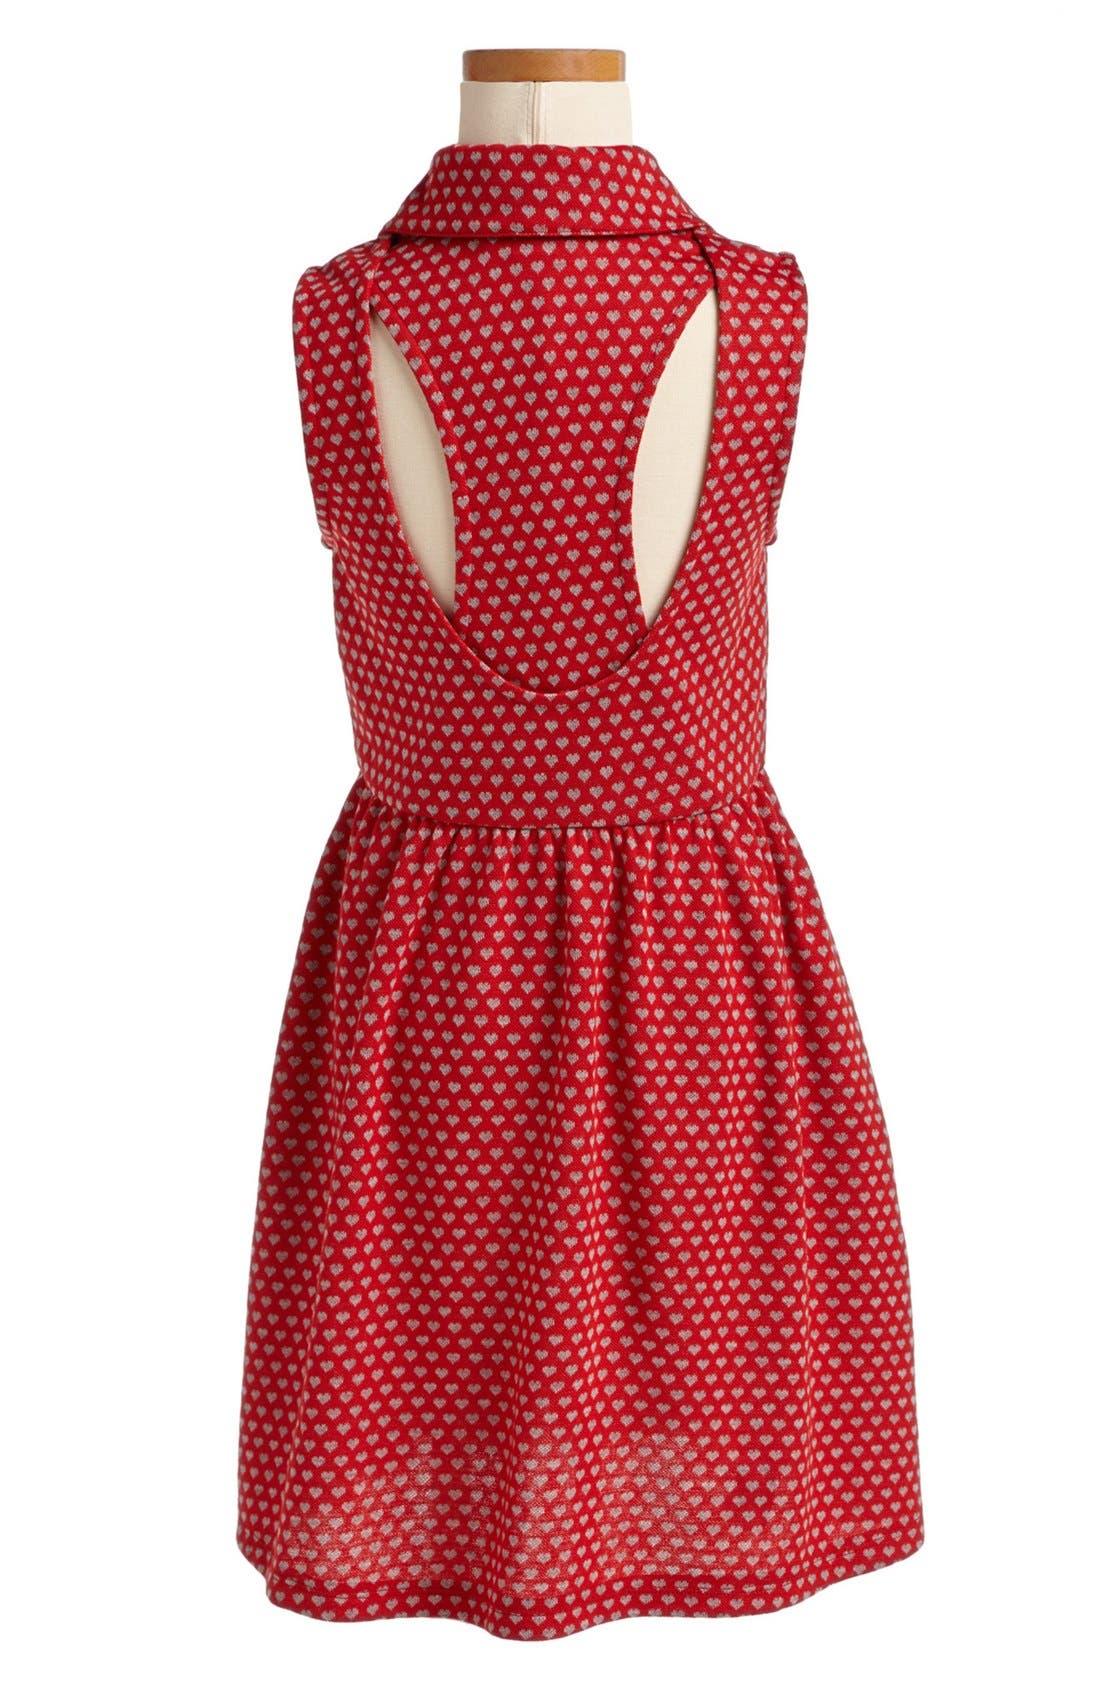 Alternate Image 2  - Mia Chica 'Heart' Dress (Big Girls)